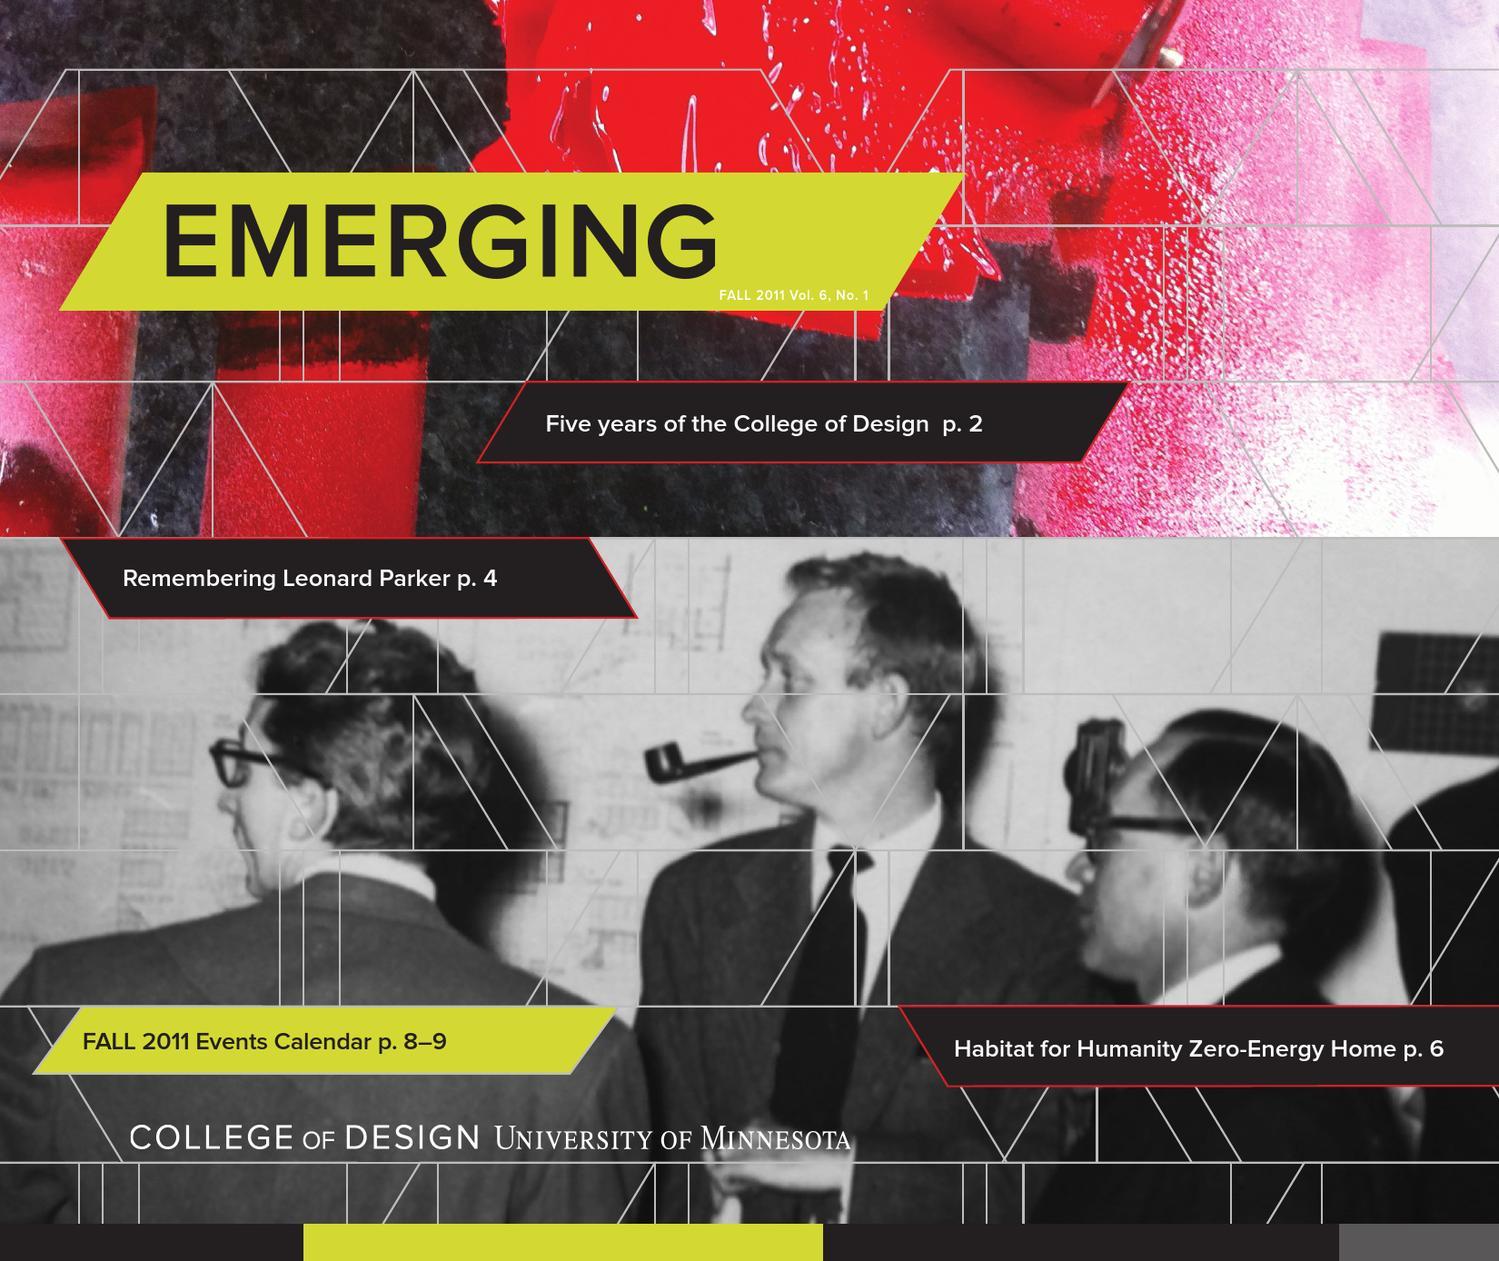 Umn Academic Calendar.Umn College Of Design Fall 2011 By University Of Minnesota College